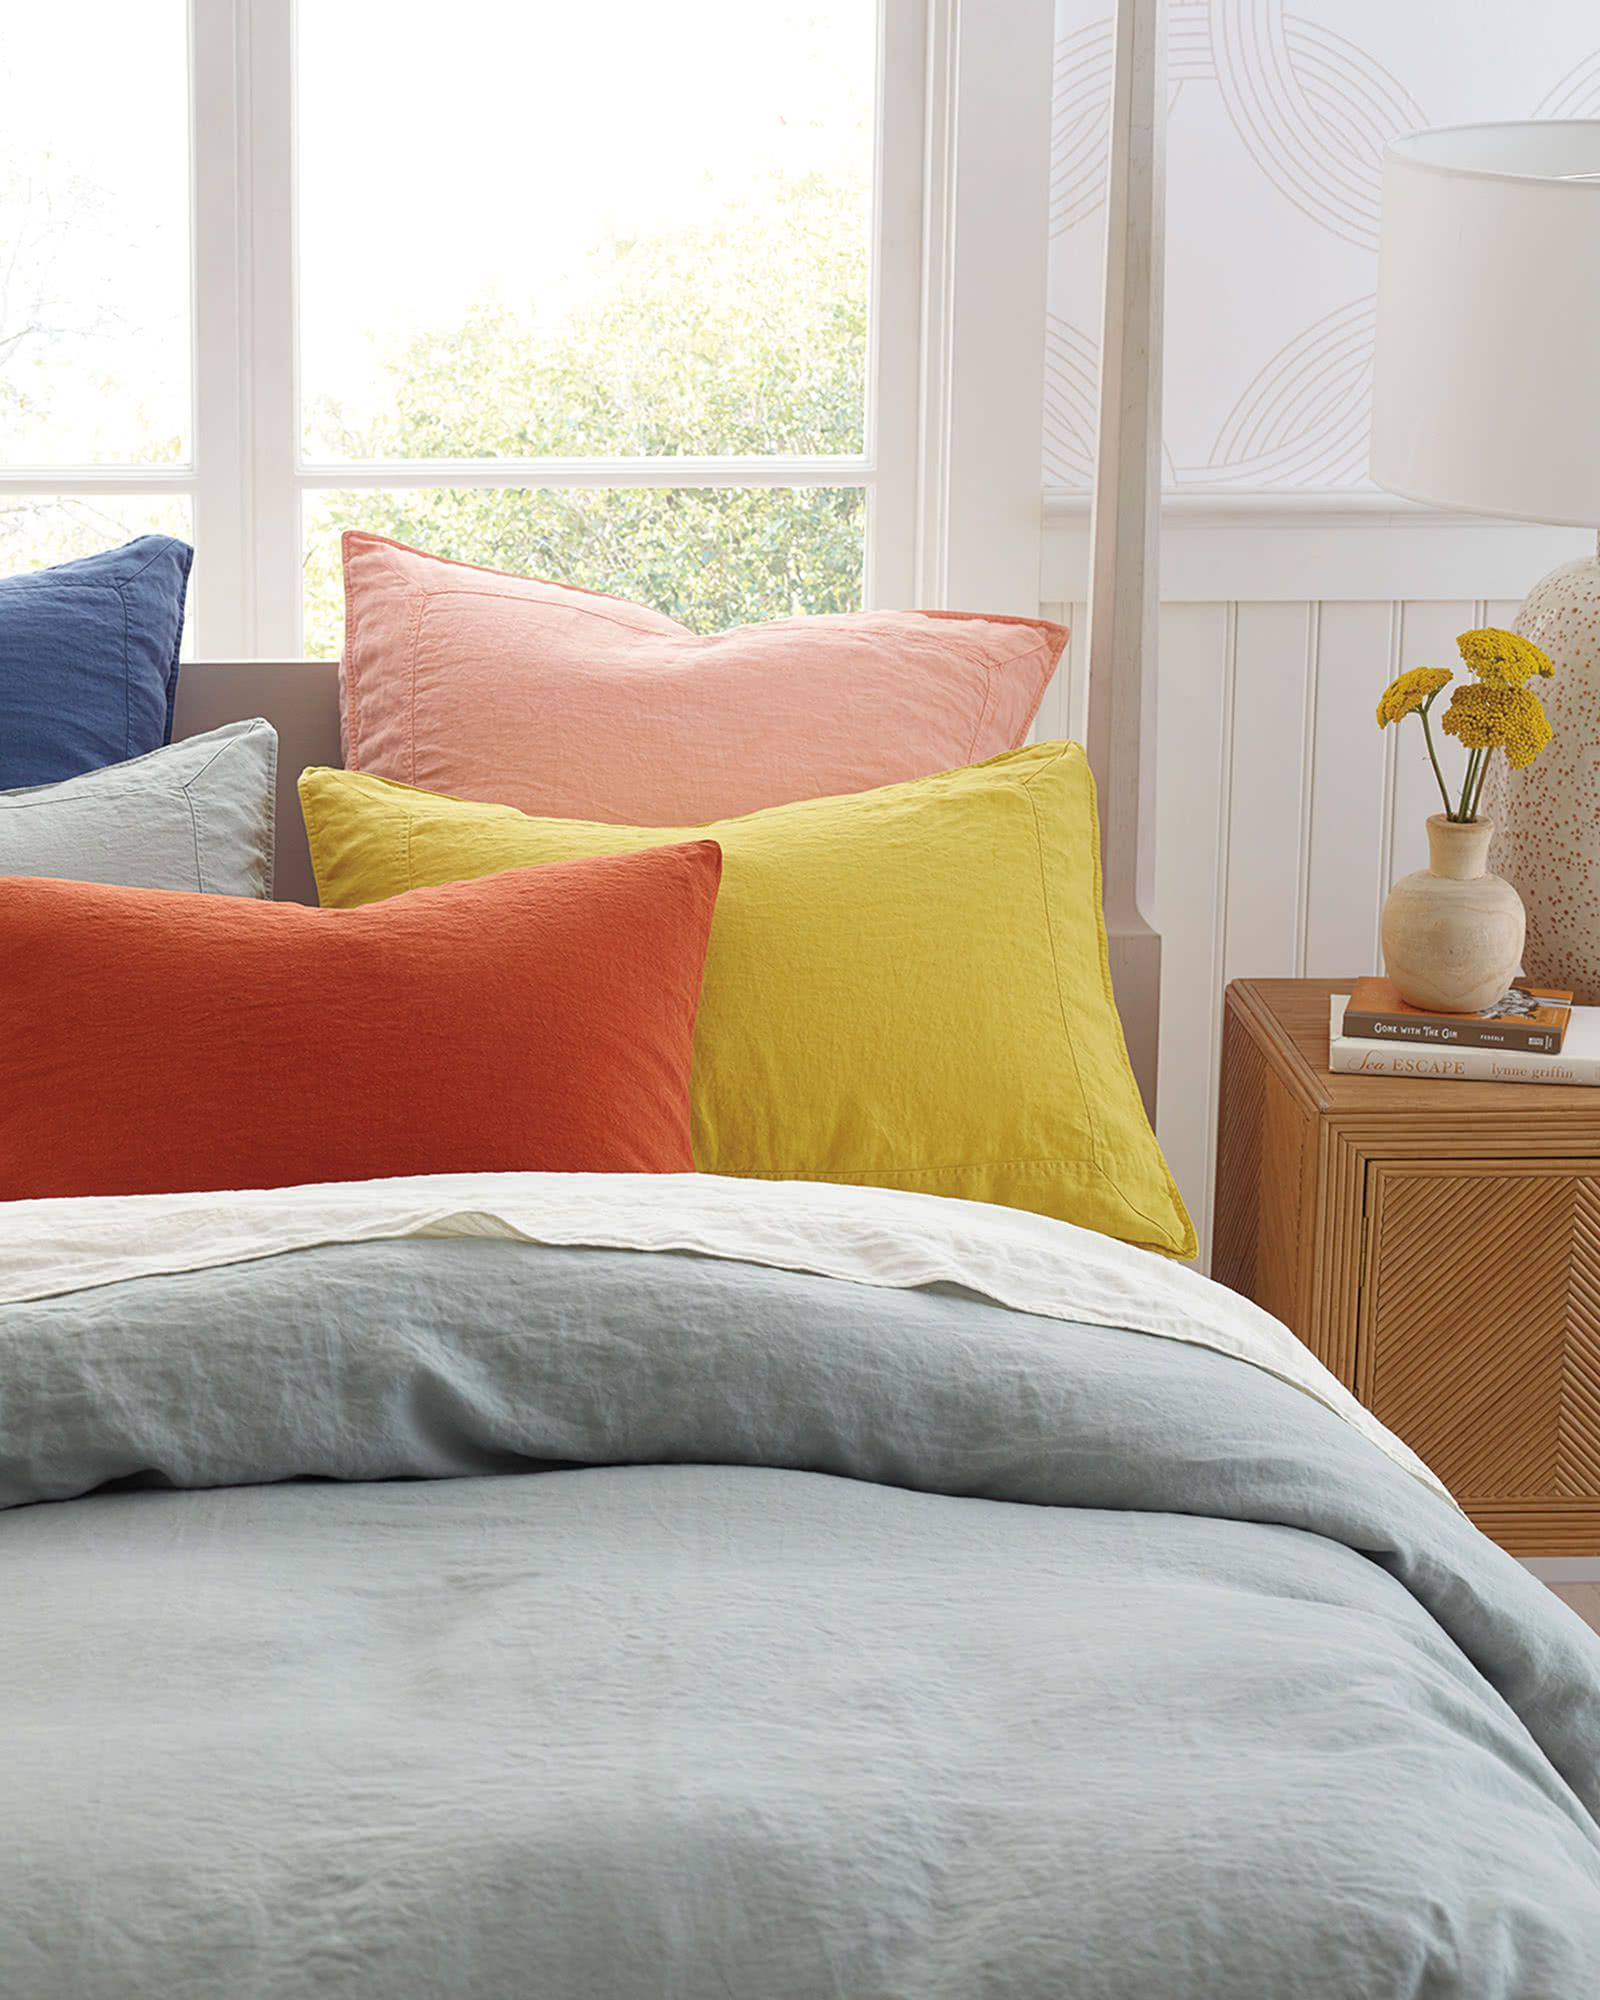 Positano Linen Duvet Cover Best Linen Sheets Linen Sheet Sets Linen Duvet Covers